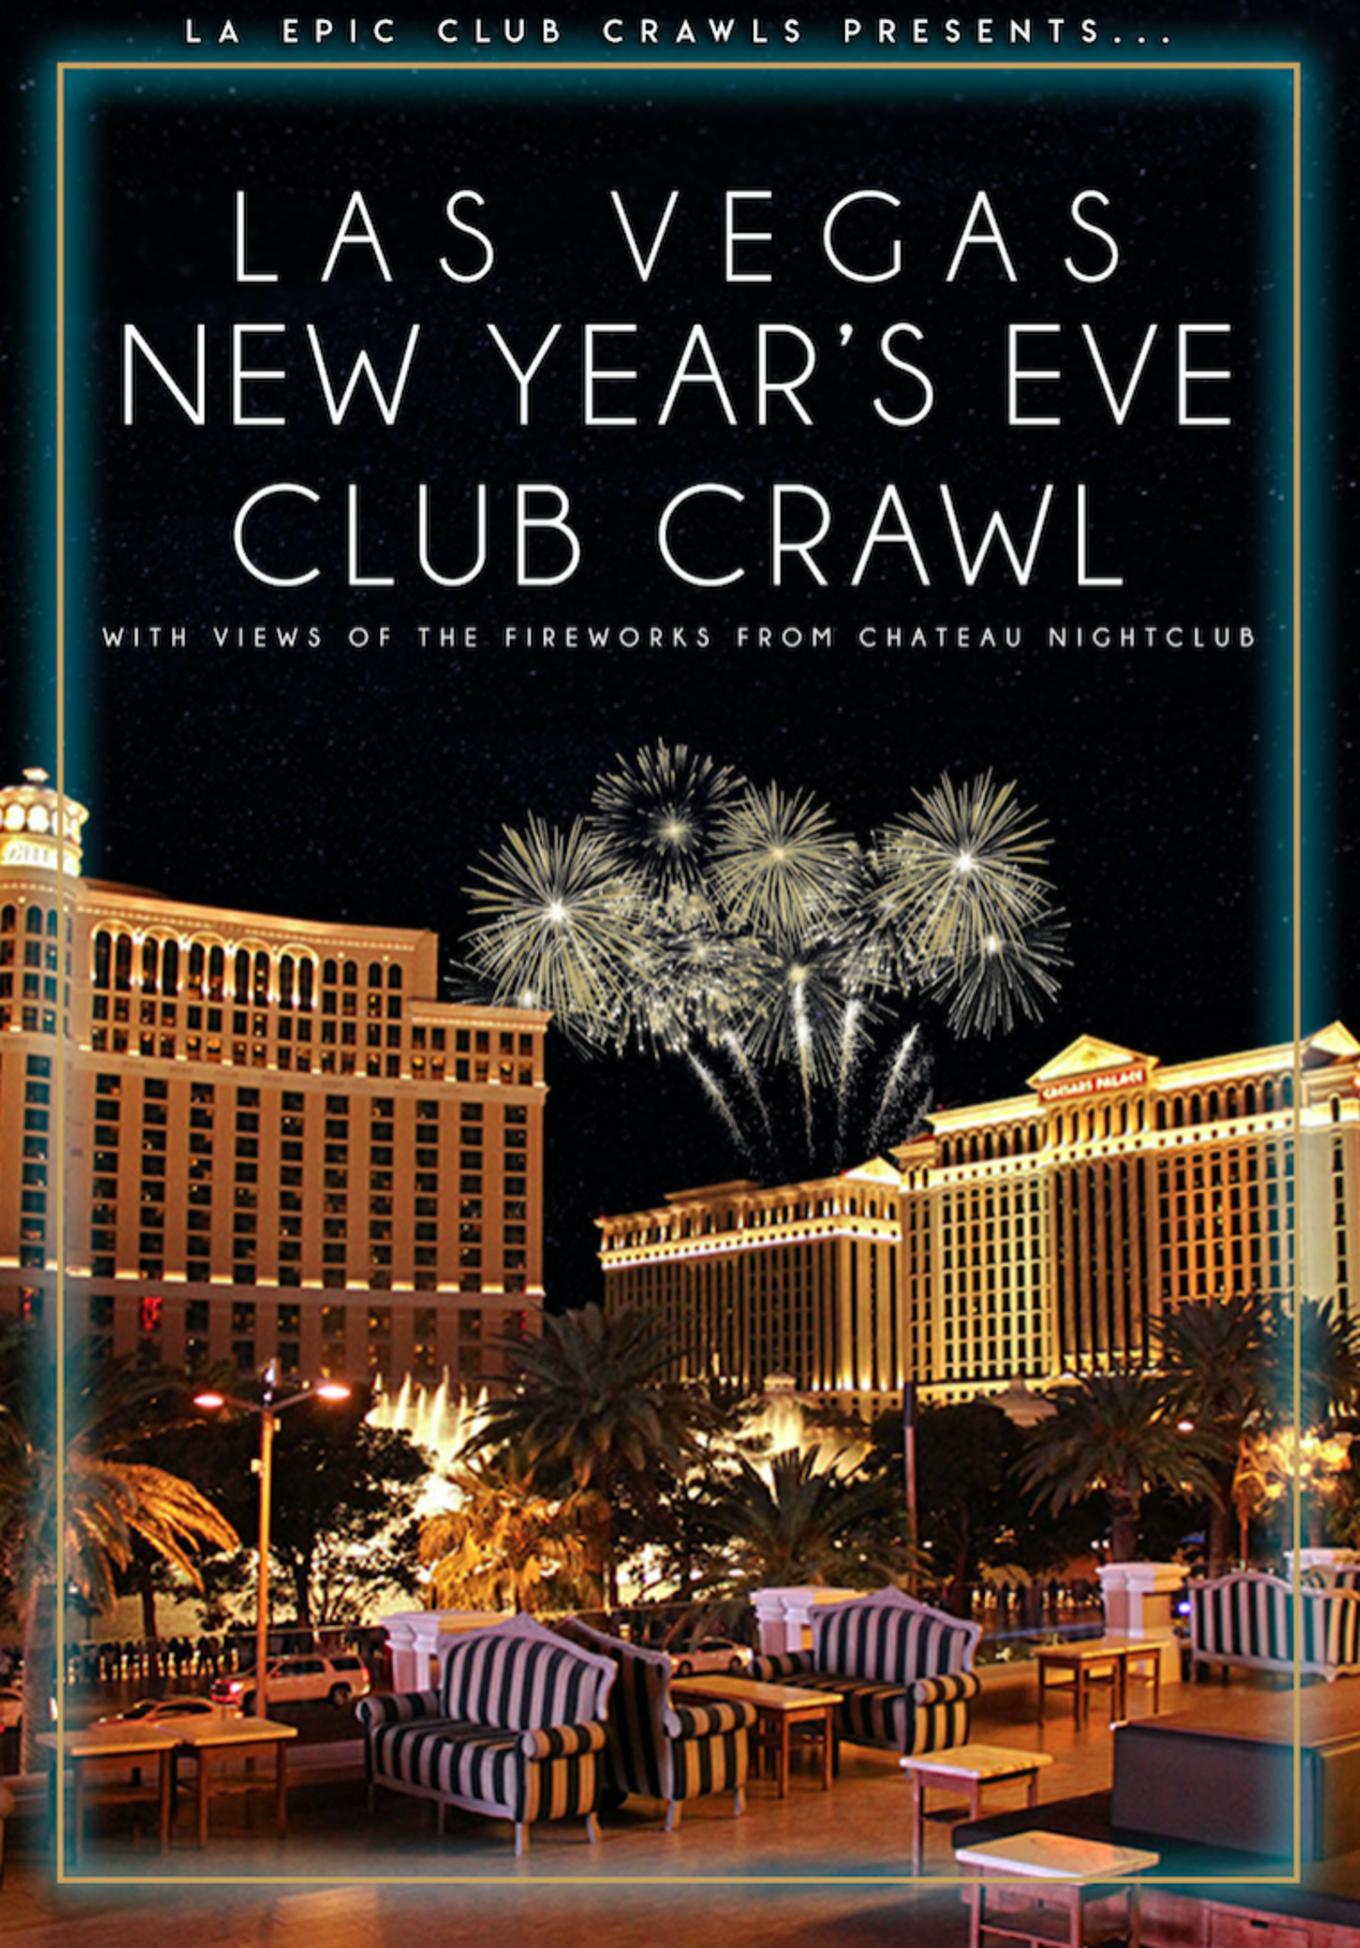 2020 Las Vegas New Years Eve Club Crawl ending at Chateau ...